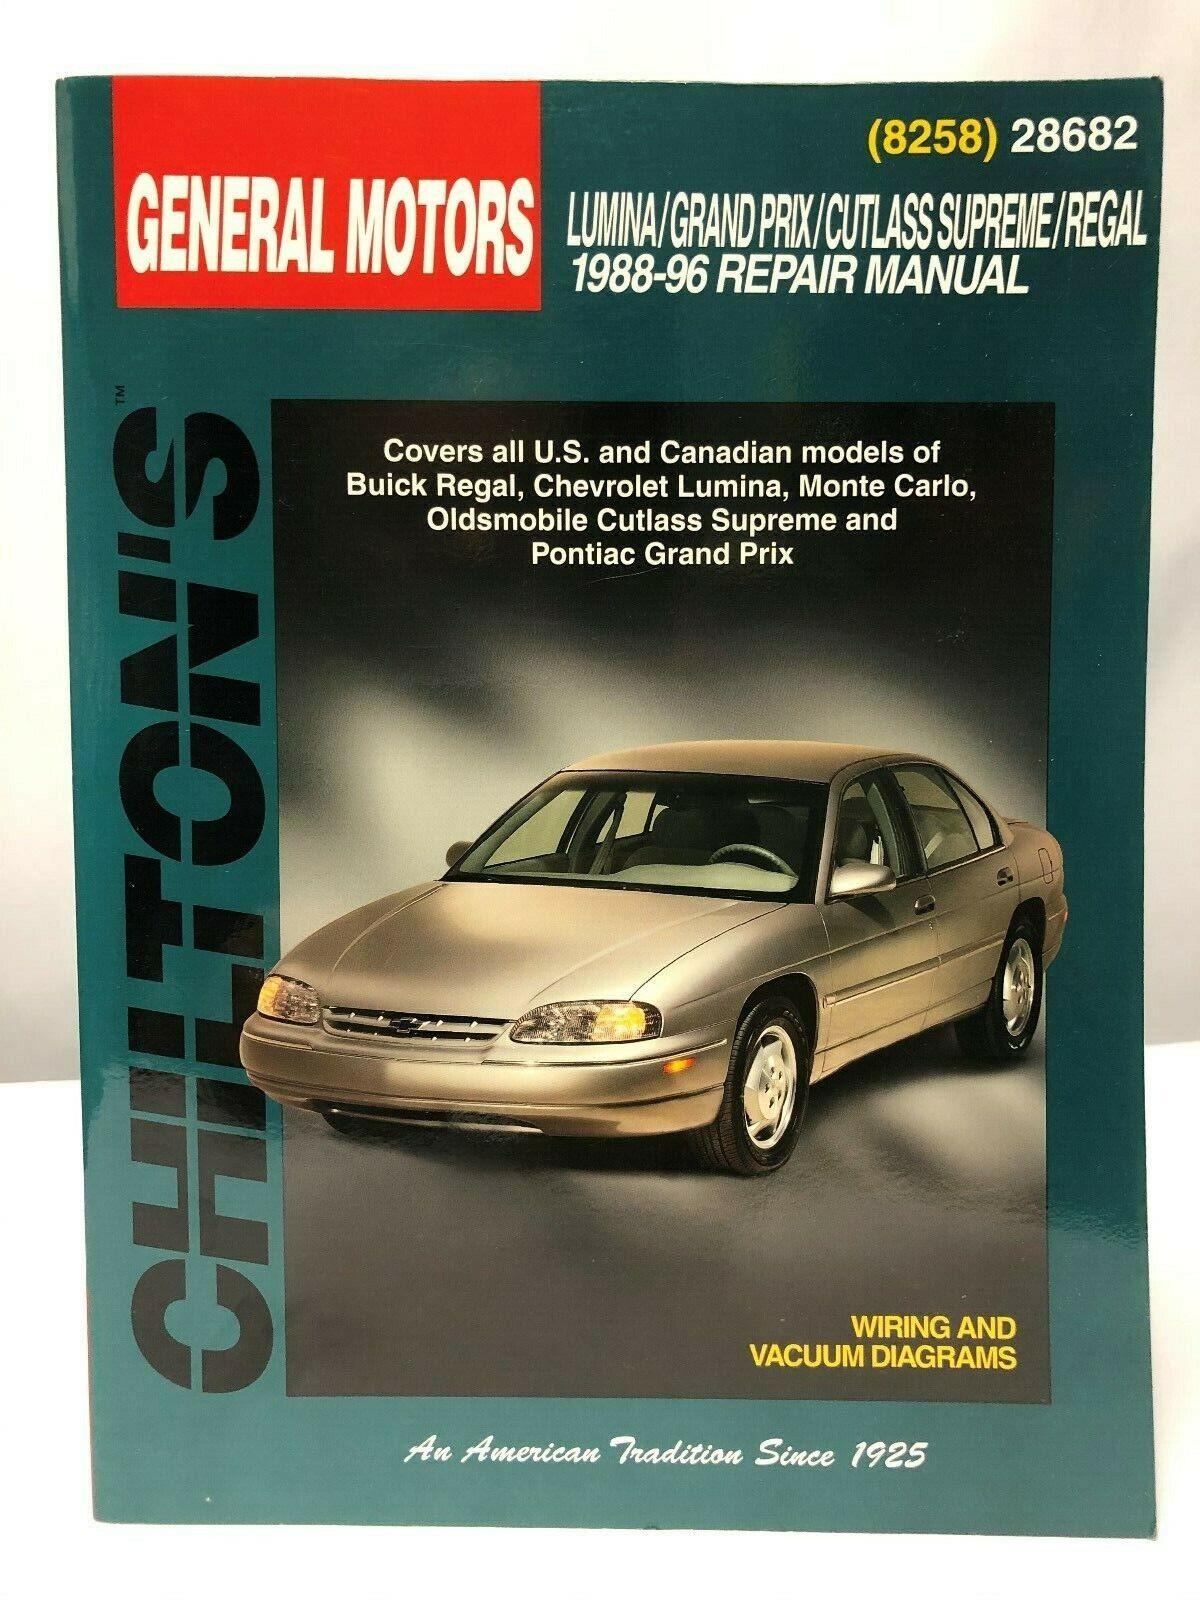 Chilton Lumina//Grand Prix//Cutlass Supreme//Regal 1988-1996 Repair Manual 28682